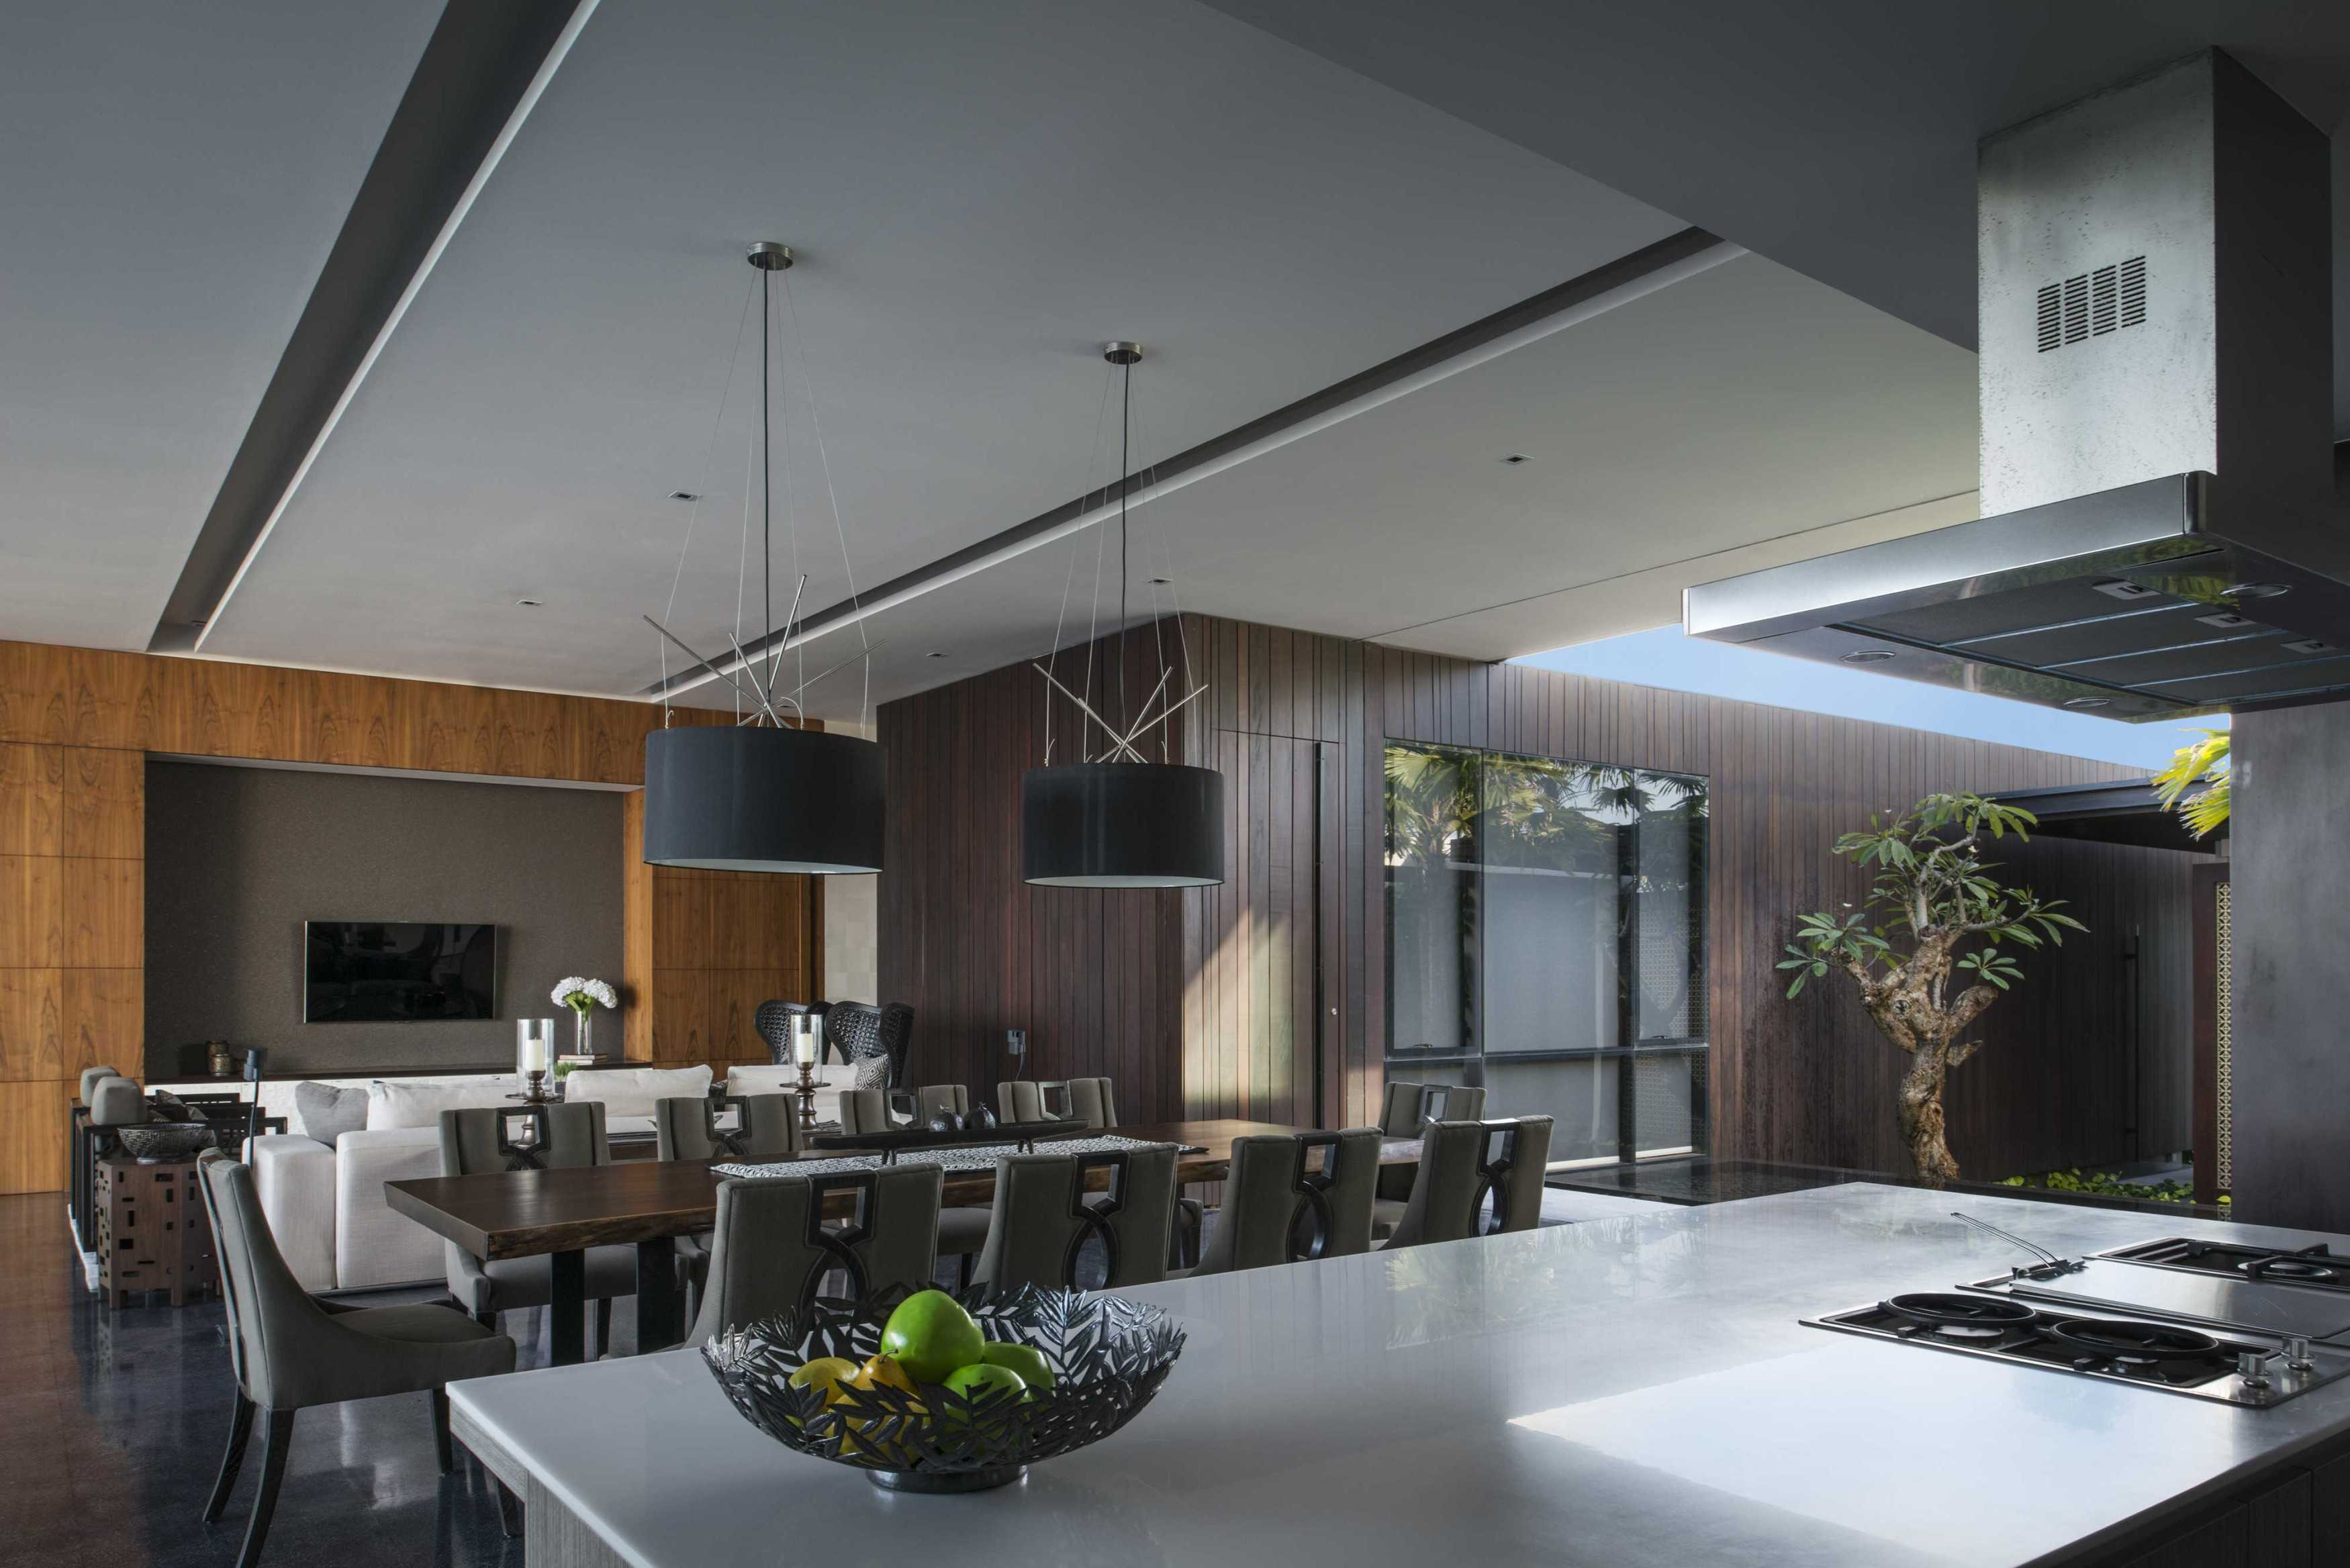 Parametr Indonesia Villa Wrk  Kutuh, Bali Kutuh, Bali Kitchen & Dining Room   15182